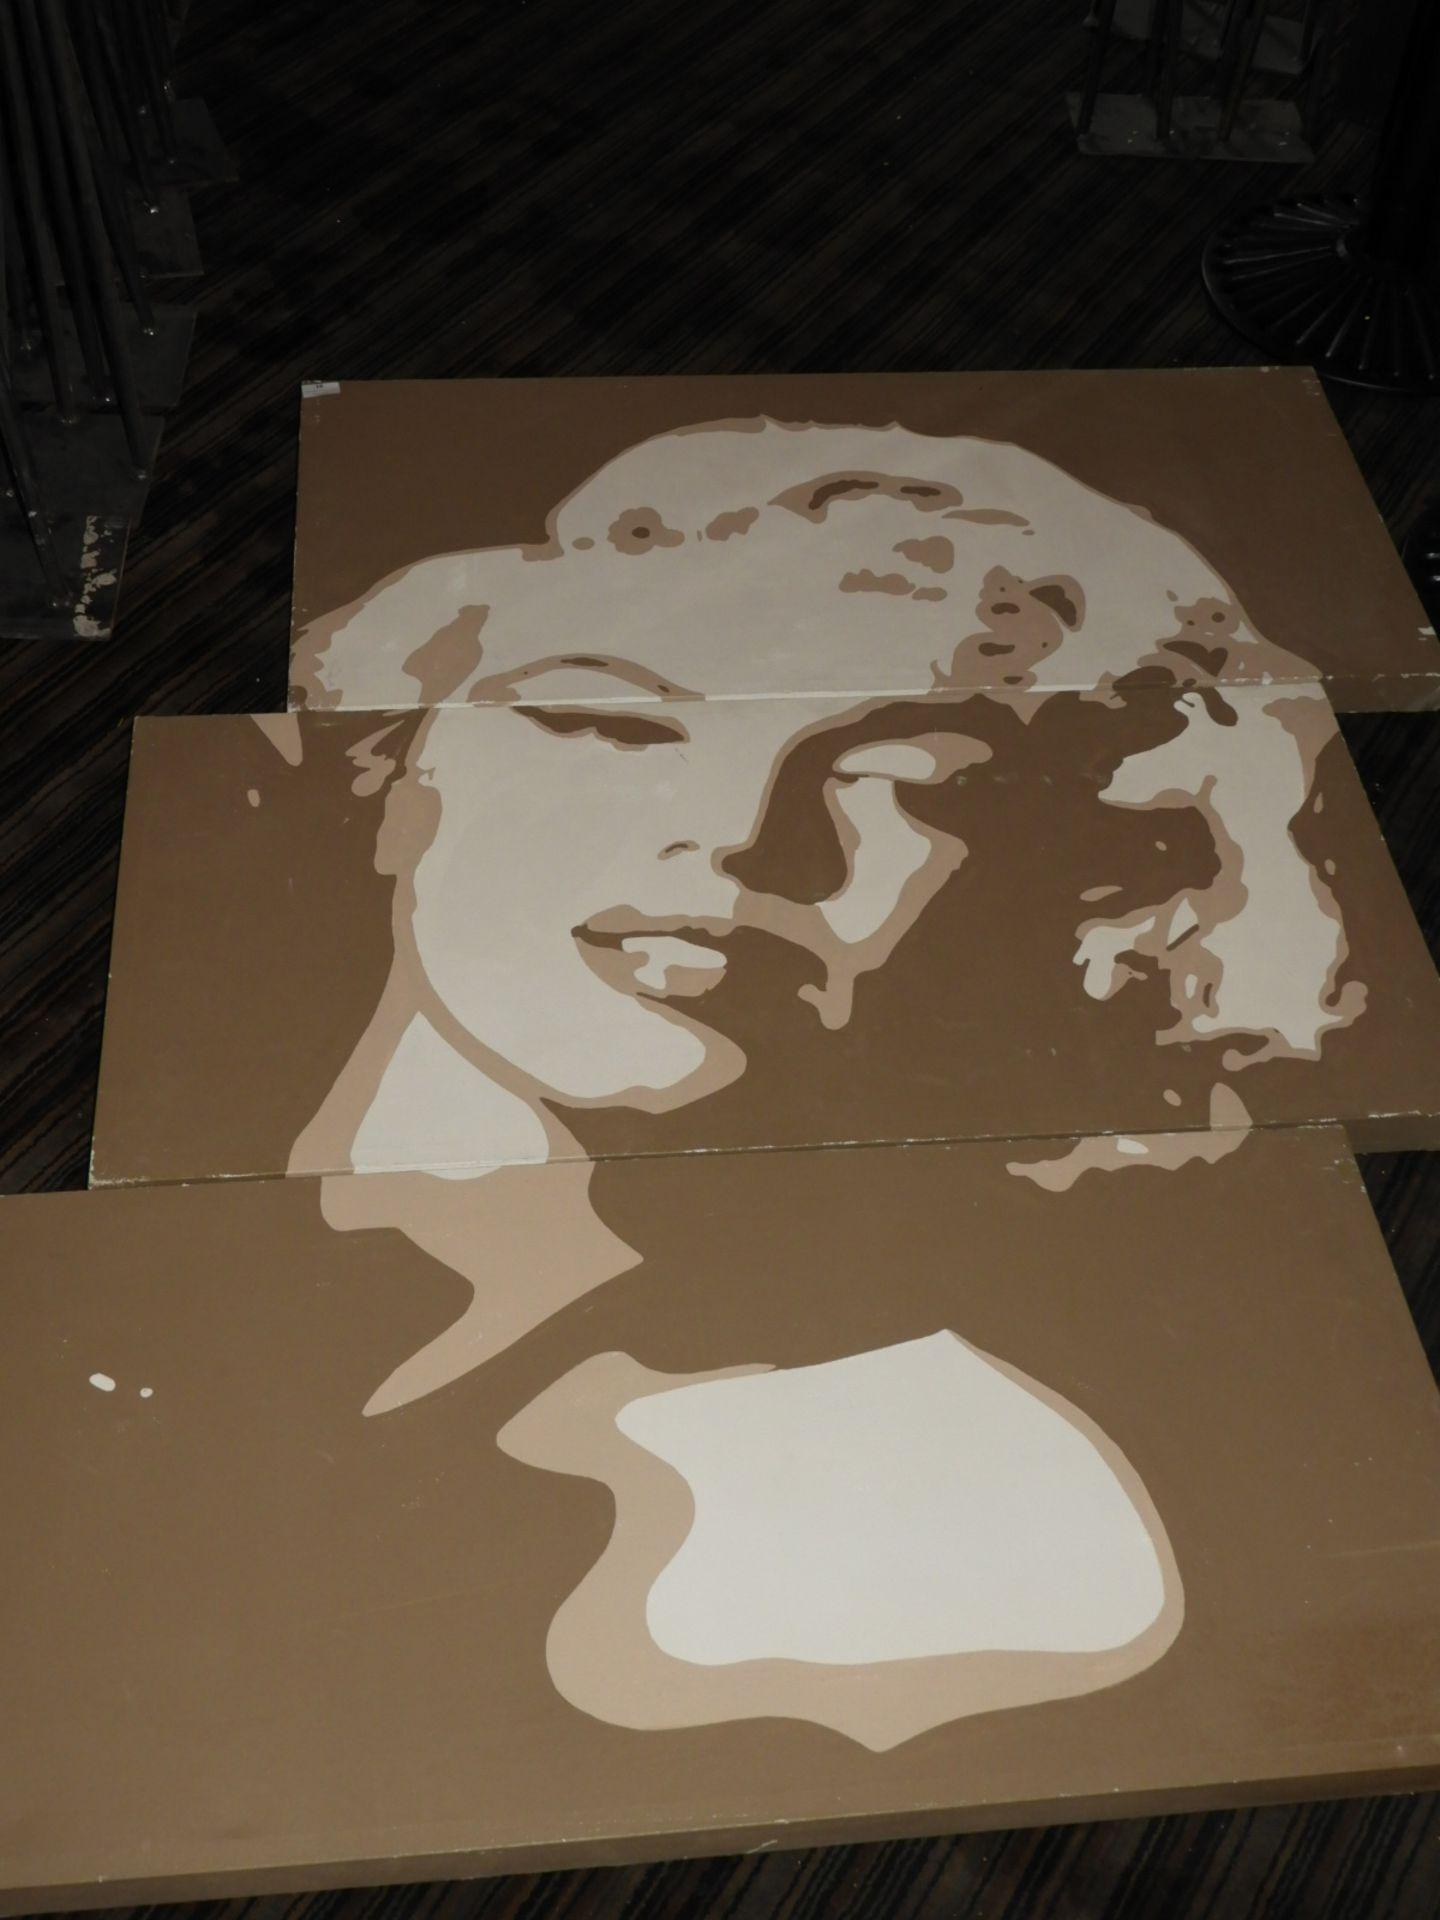 Lot 18 - *Unframed Printed Canvas - Marilyn Monroe